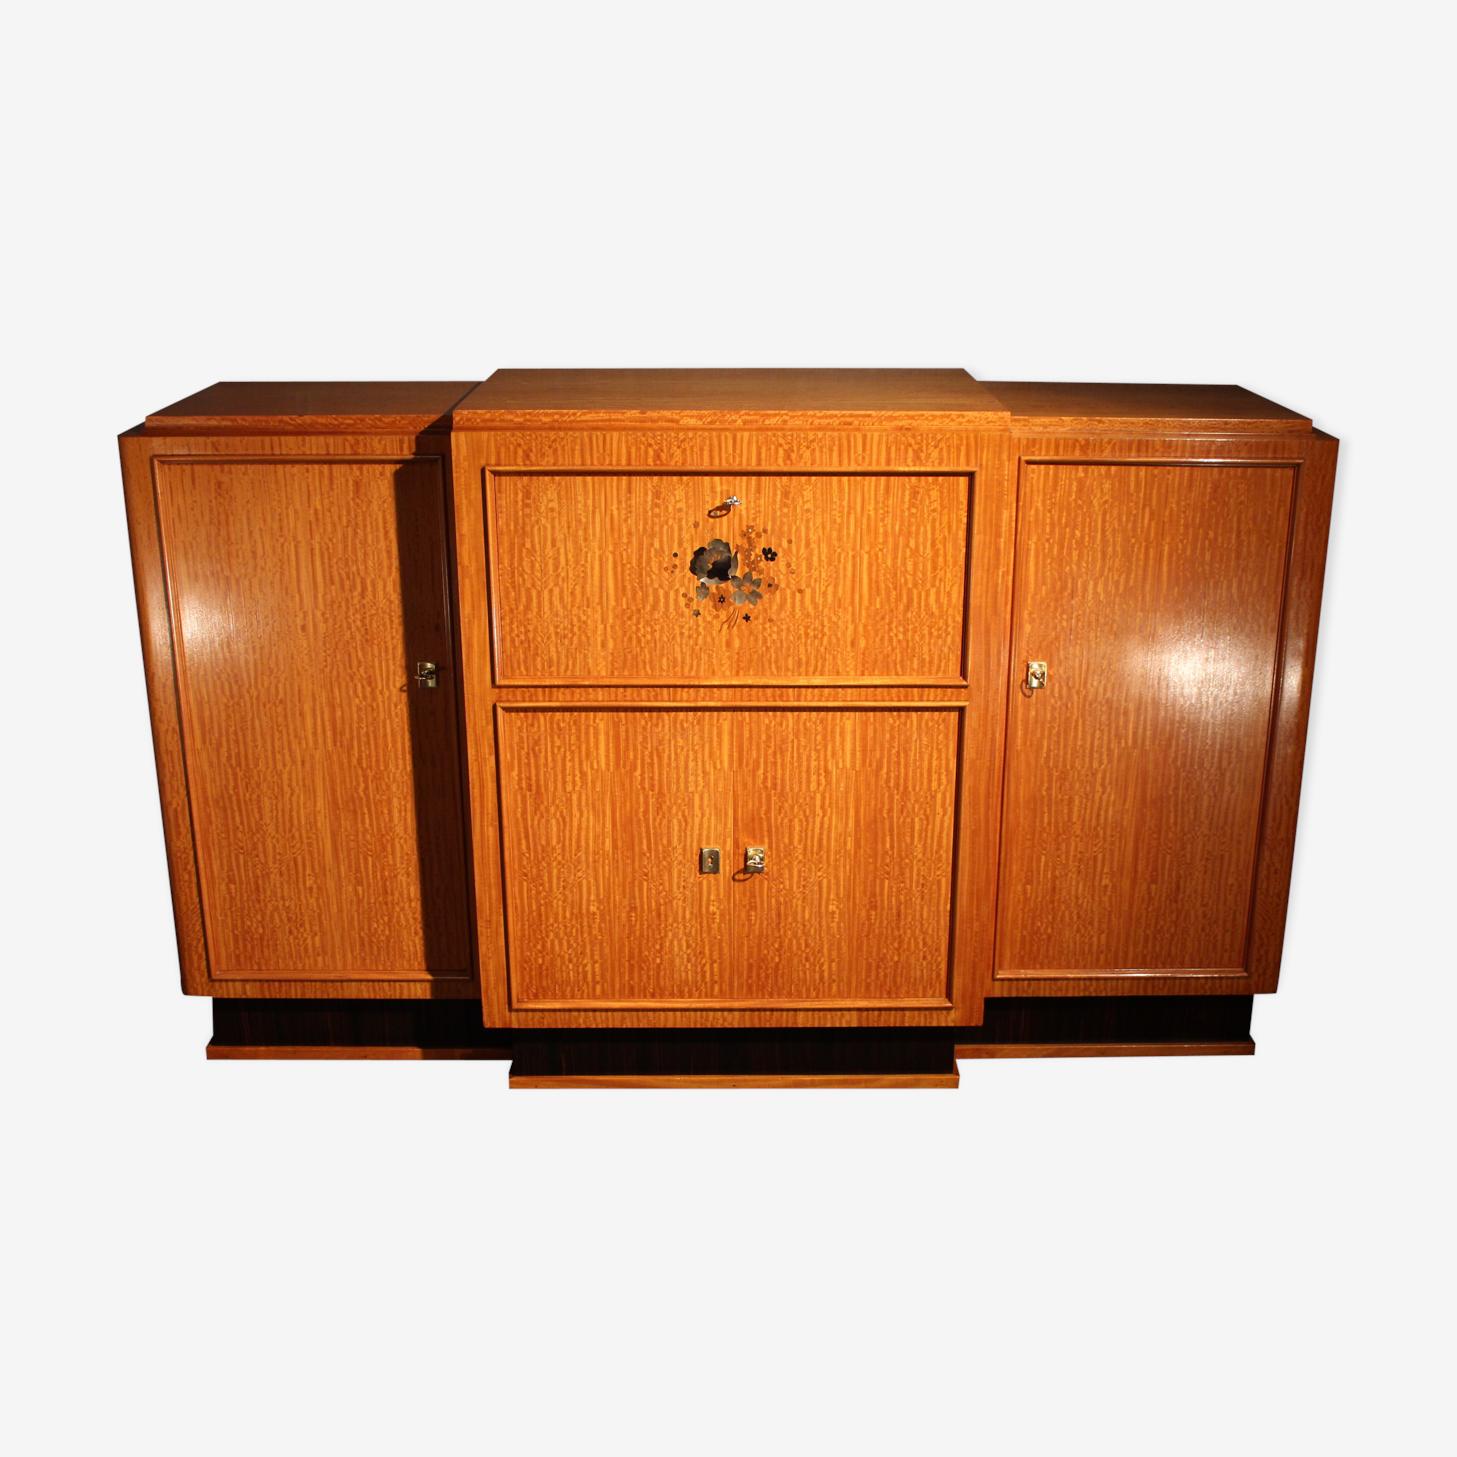 Cabinet of jules Leleu